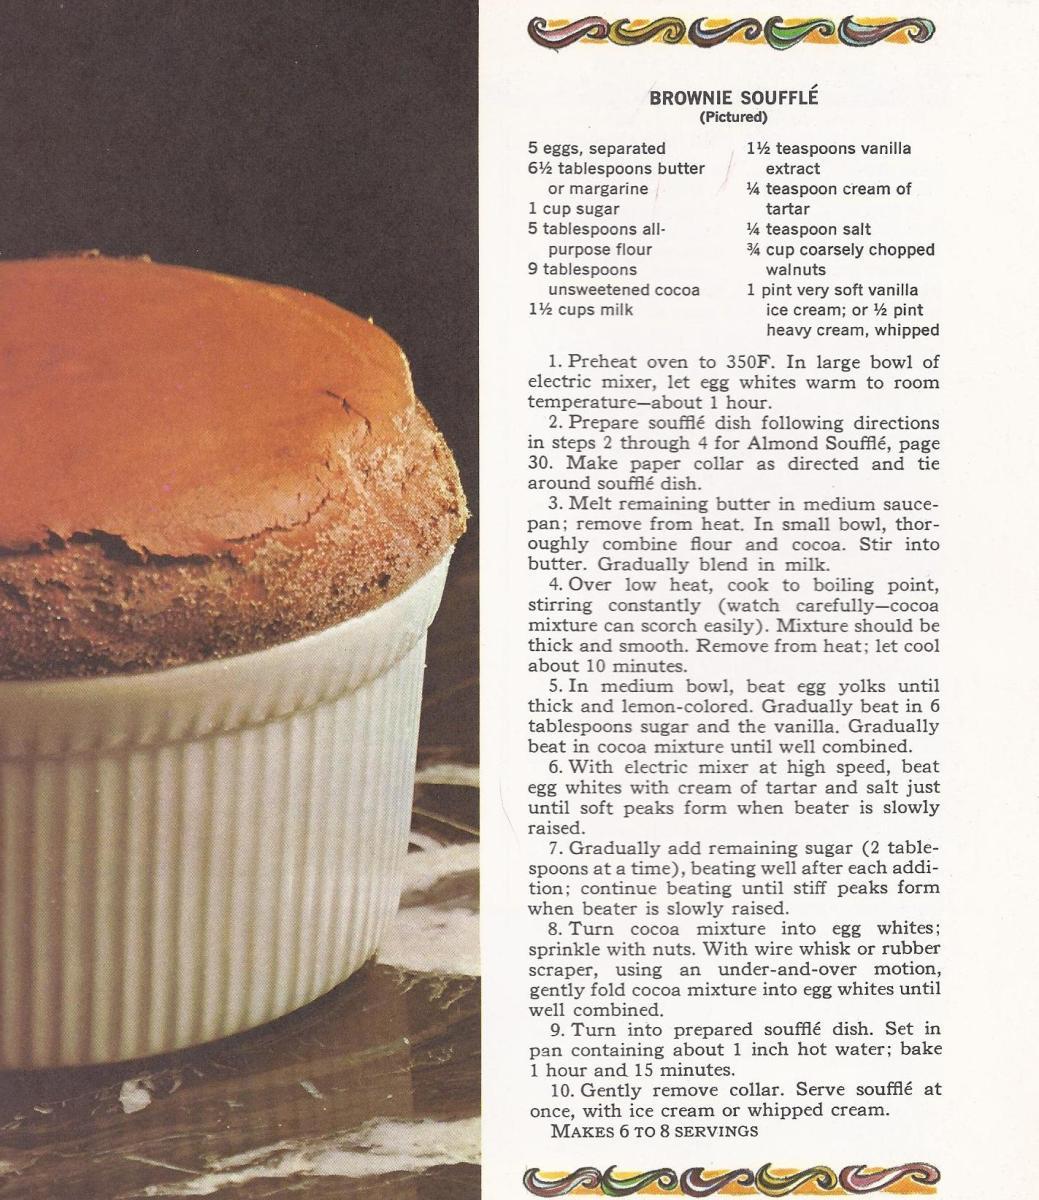 1960s Dessert Recipes, Vintage Dessert Recipes, Brownie Souffle